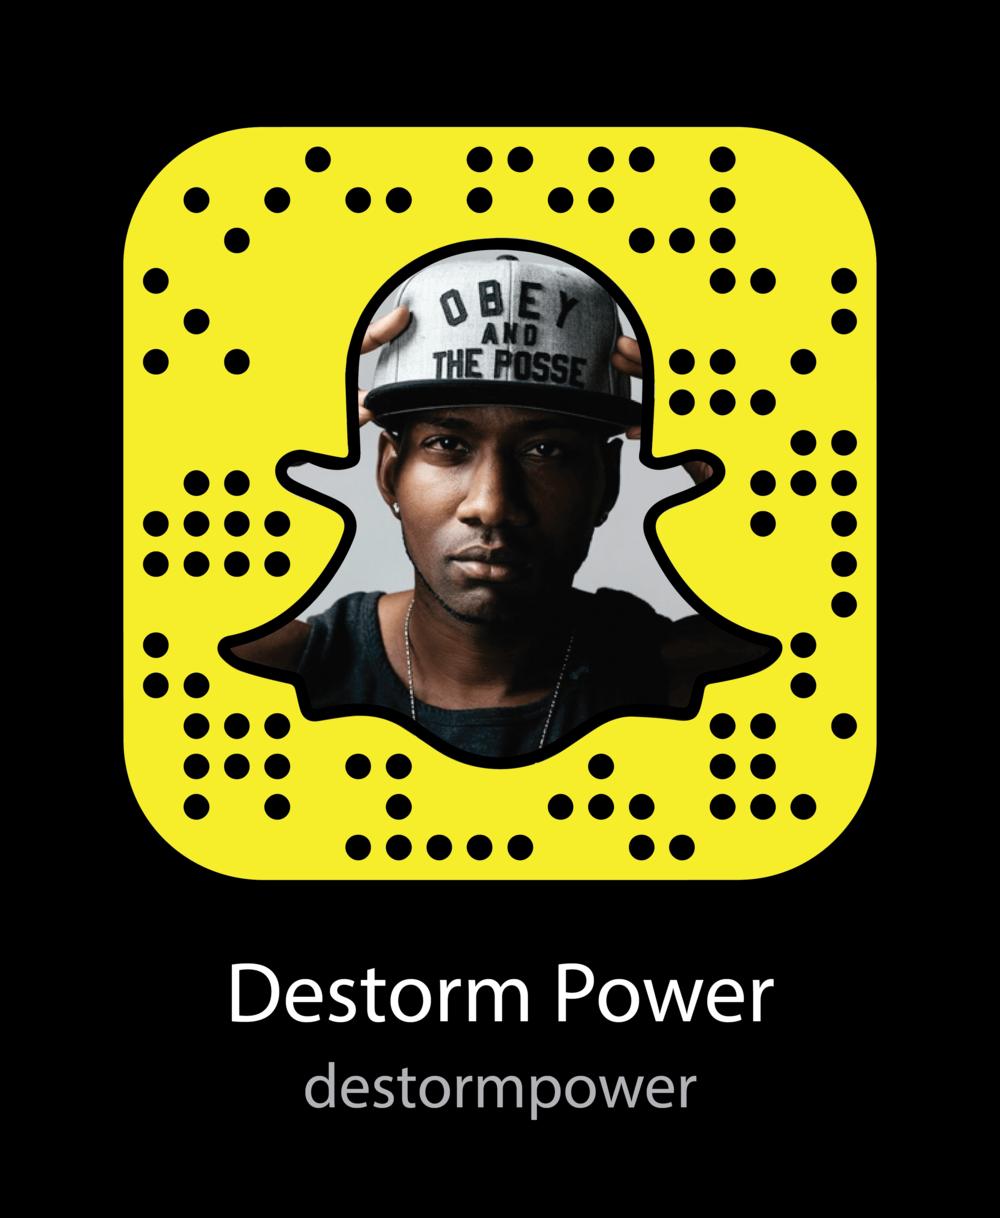 destorm-power-vine-celebrity-snapchat-snapcode